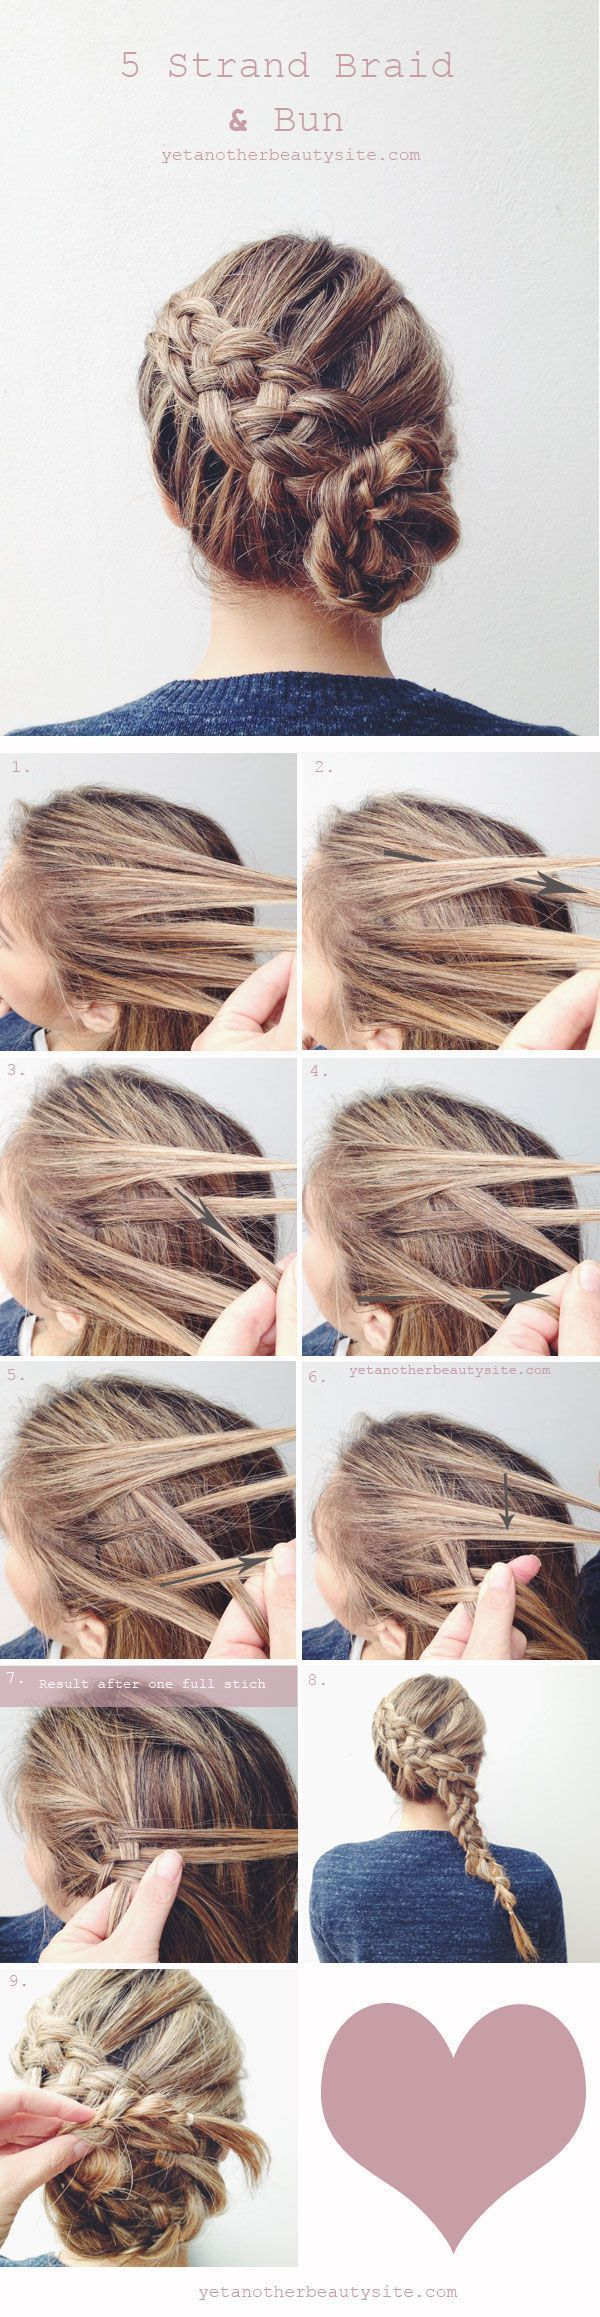 Hairstyle cute strand braid and bun tutorial beauty